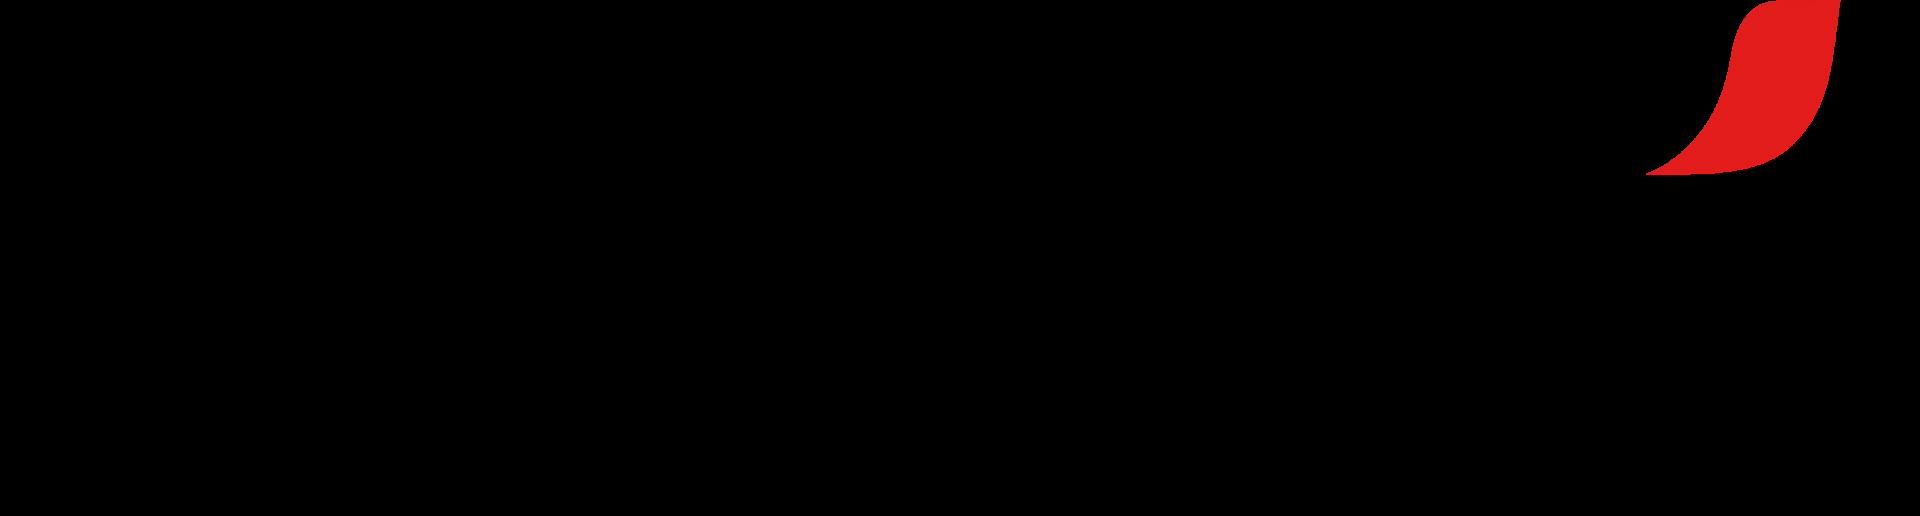 Nescafe_logo_logotype